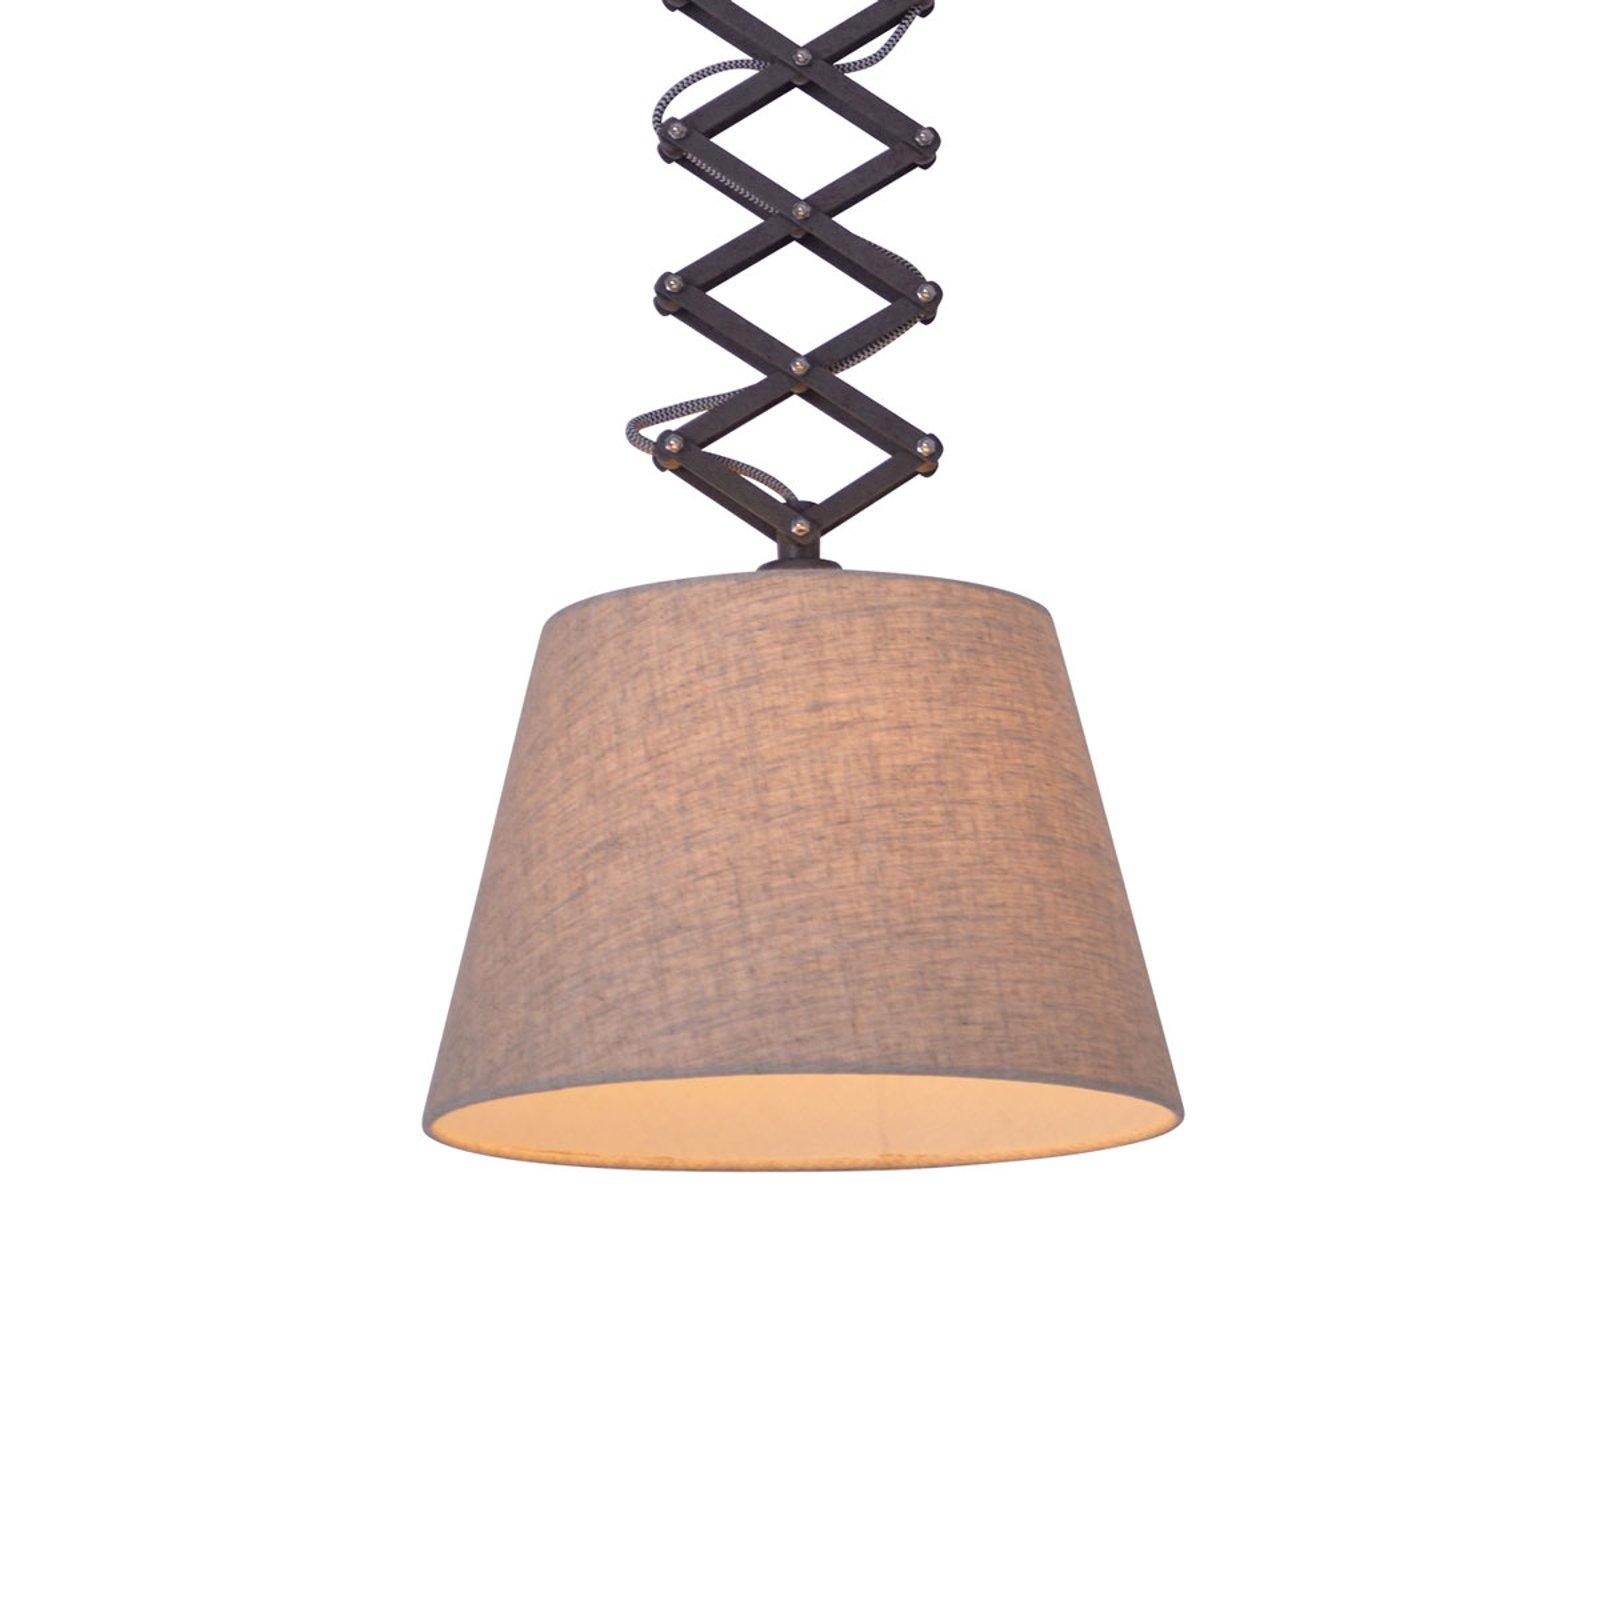 Adrienne tekstil-taklampe høydejusterbar